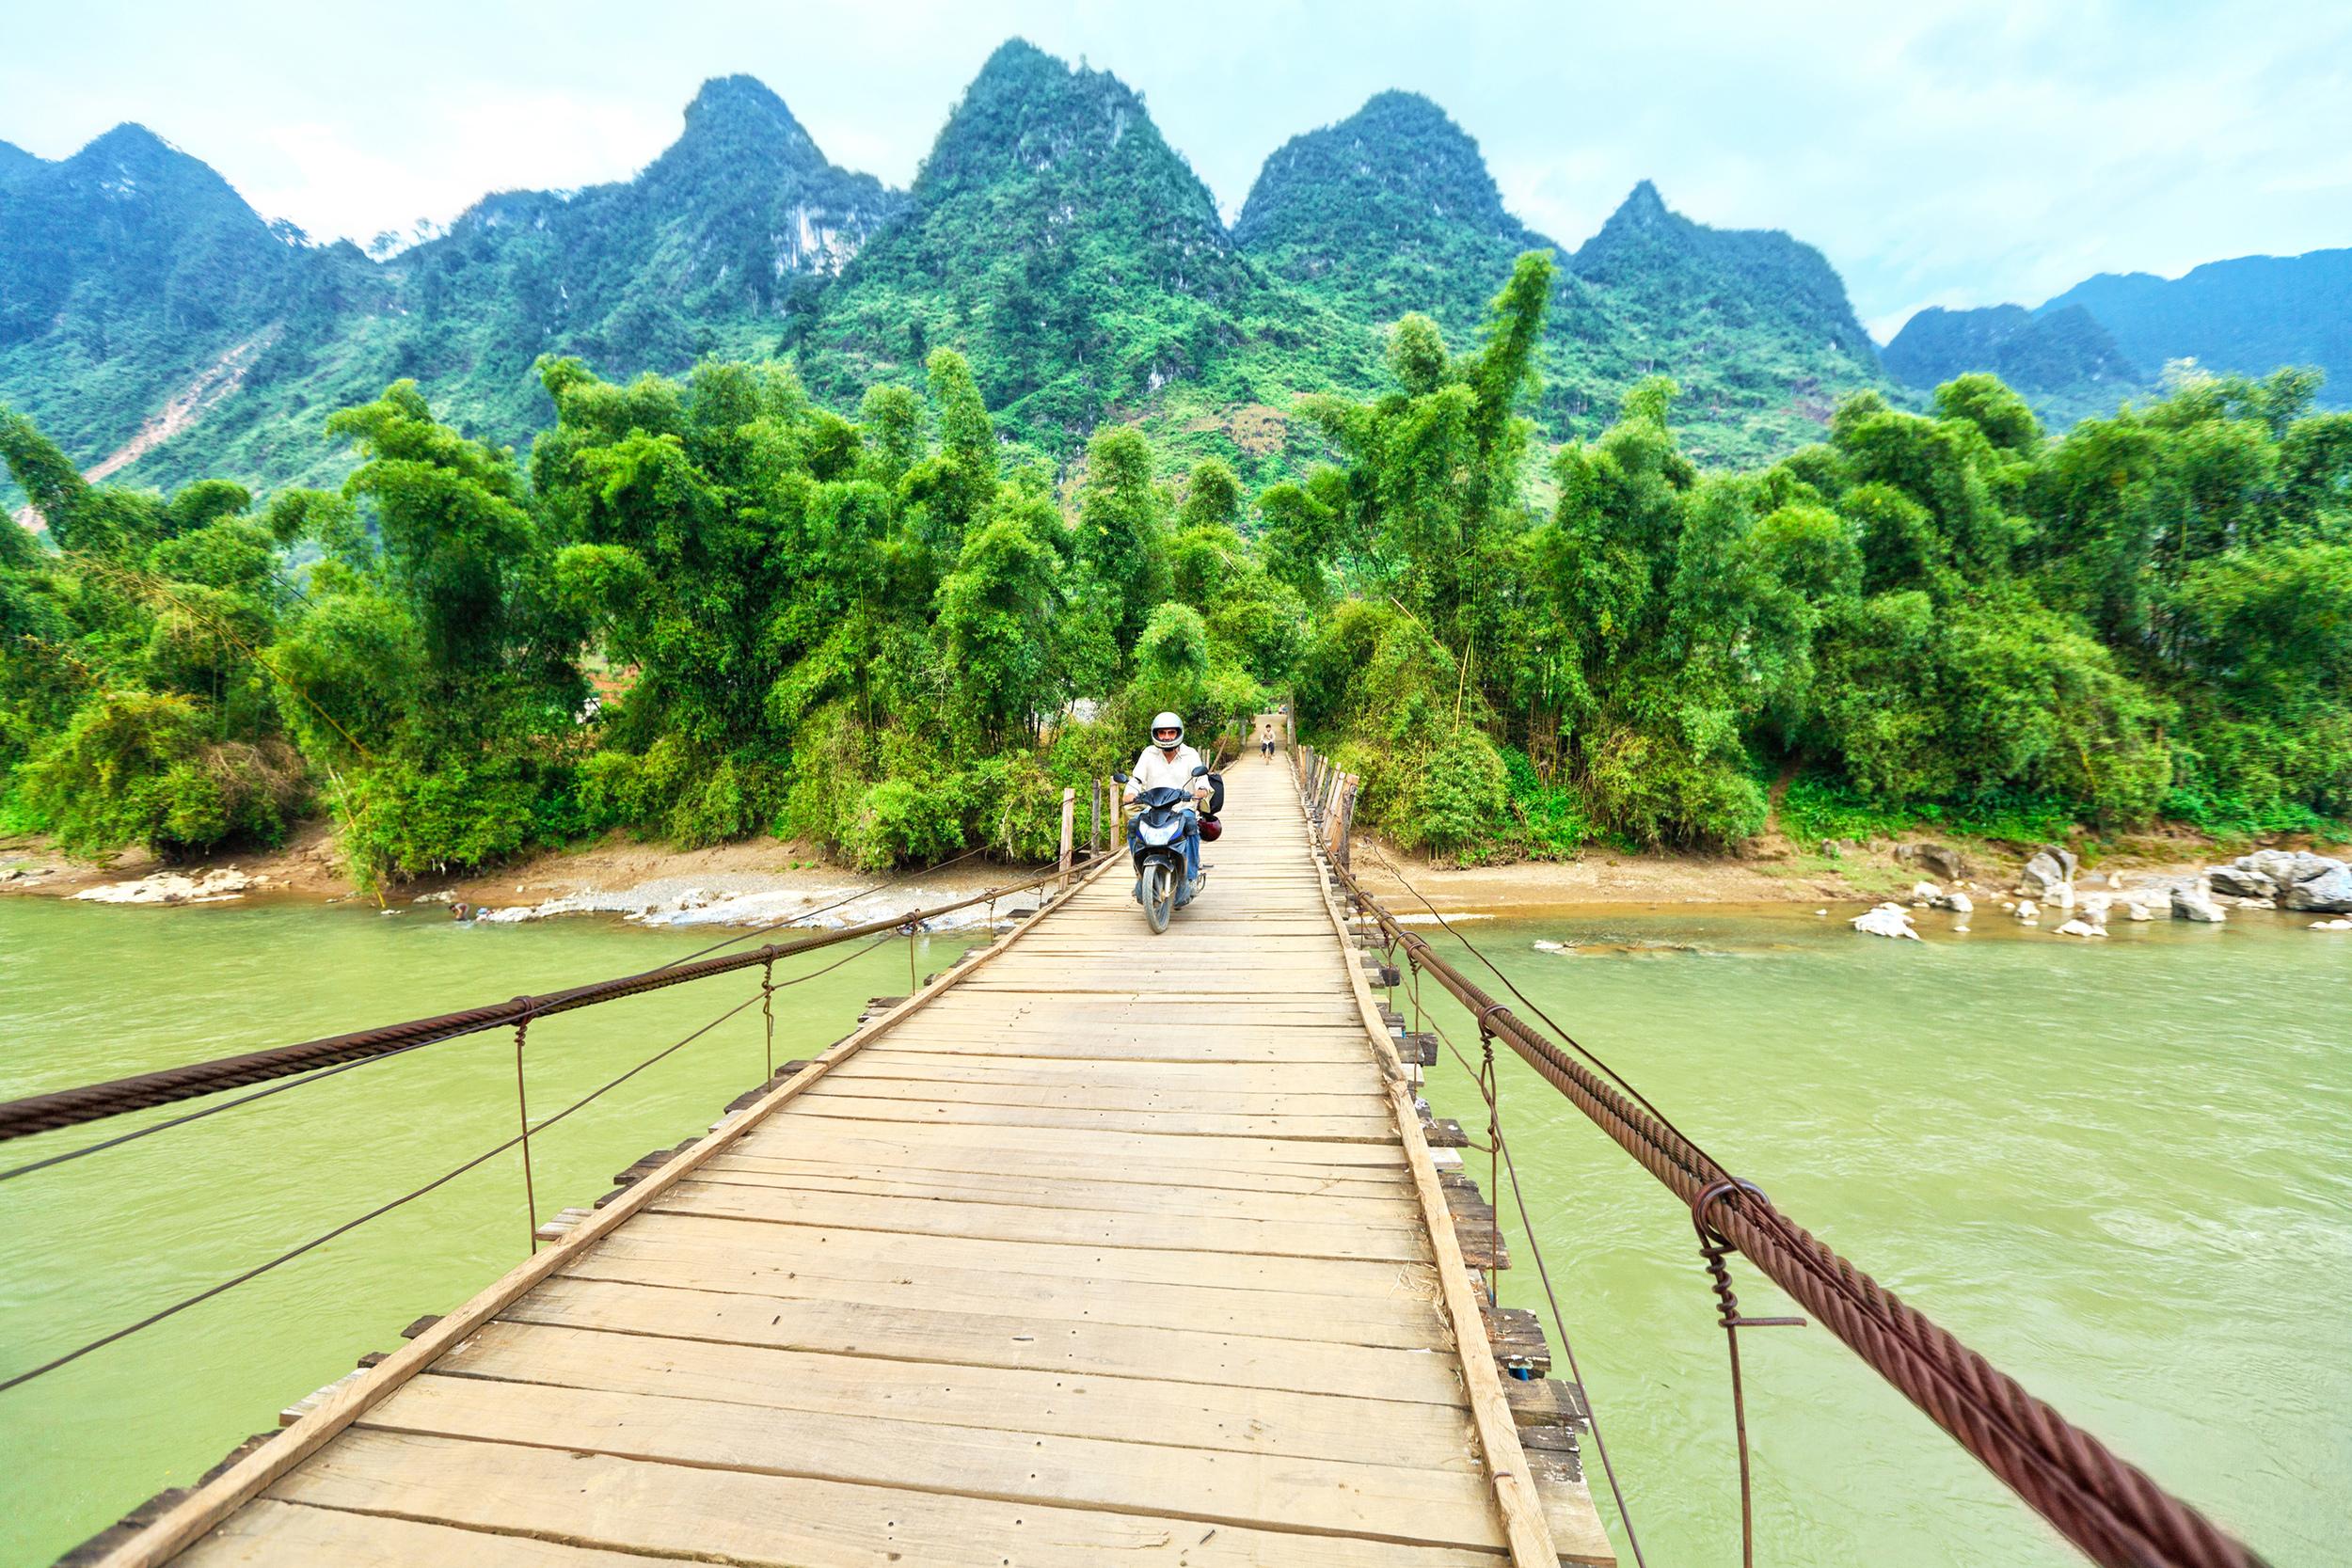 riding motorbikes in asia